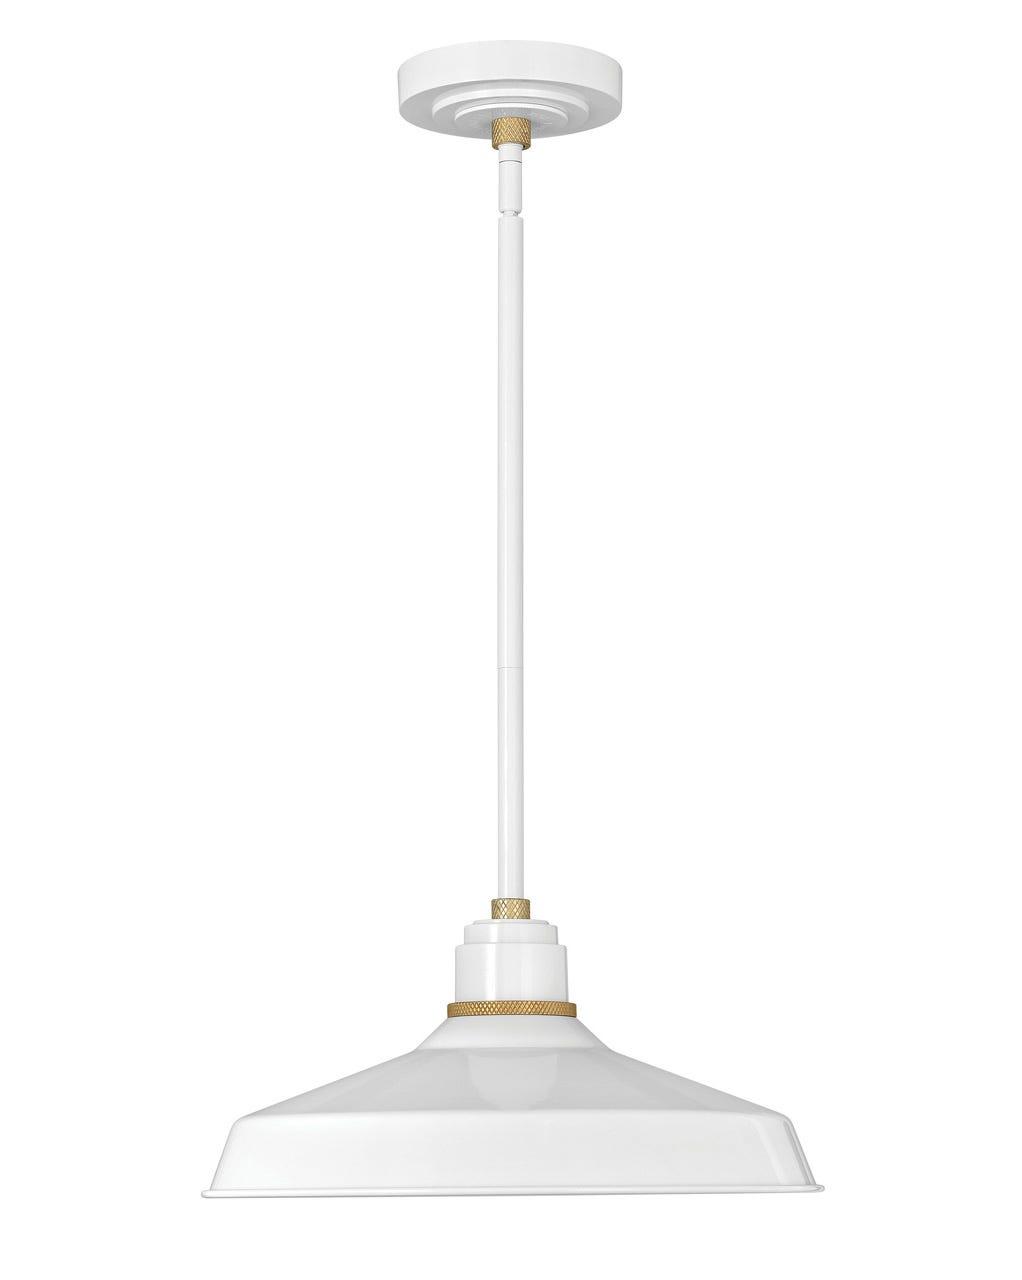 Hinkley Lighting 10231TK Foundry Classic Outdoor Wall Barn Light Textured Black